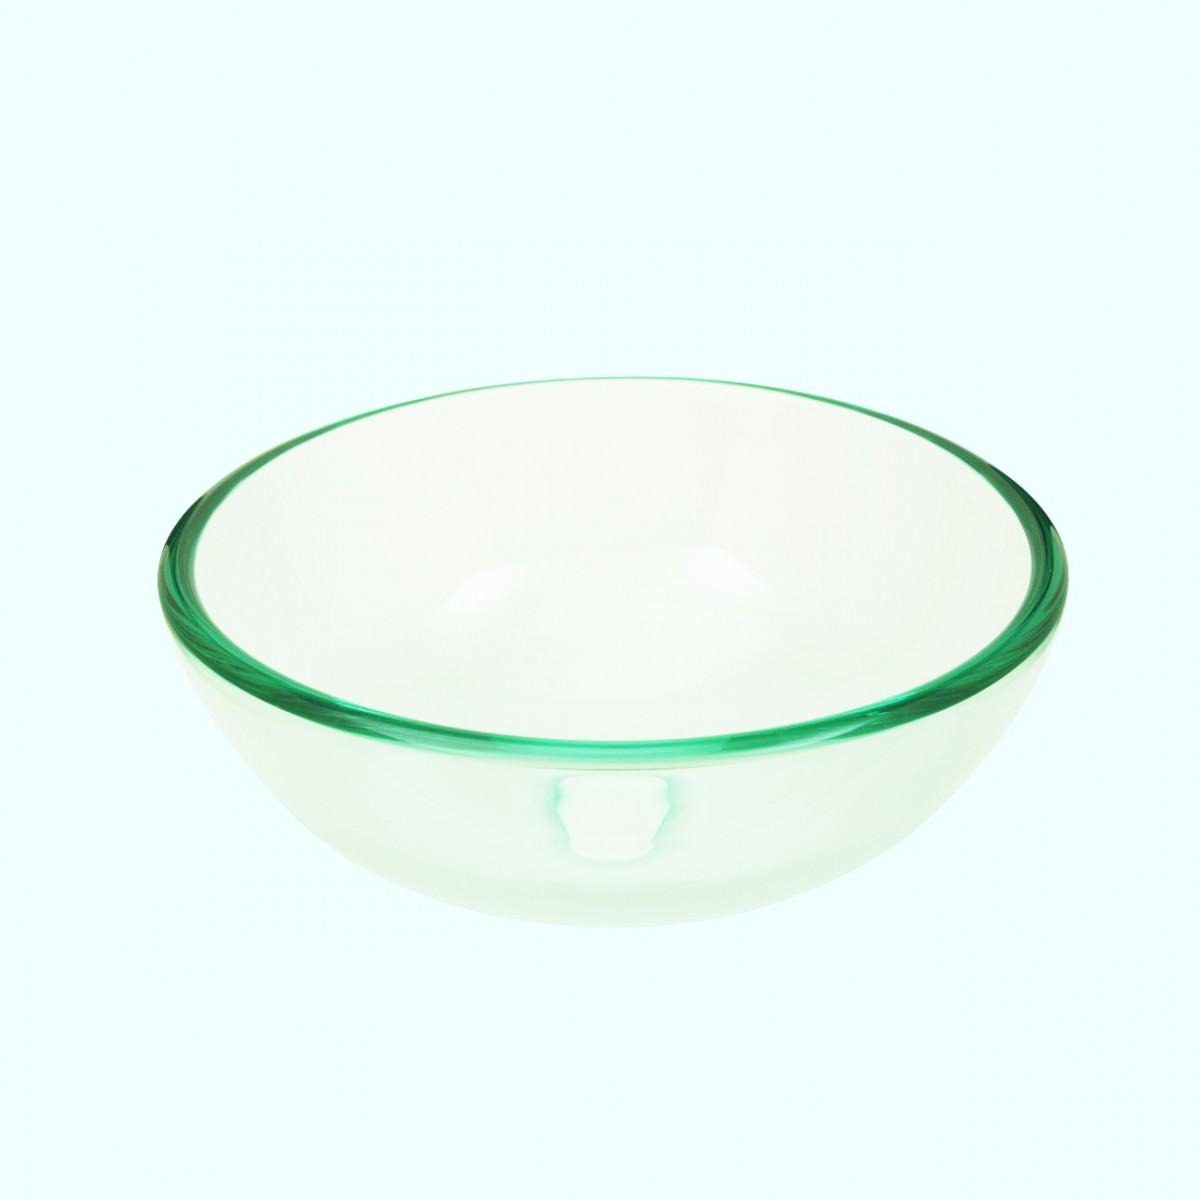 Bathroom tempered glass vessel sink clear mini bowl round - Bathroom tempered glass vessel sink ...